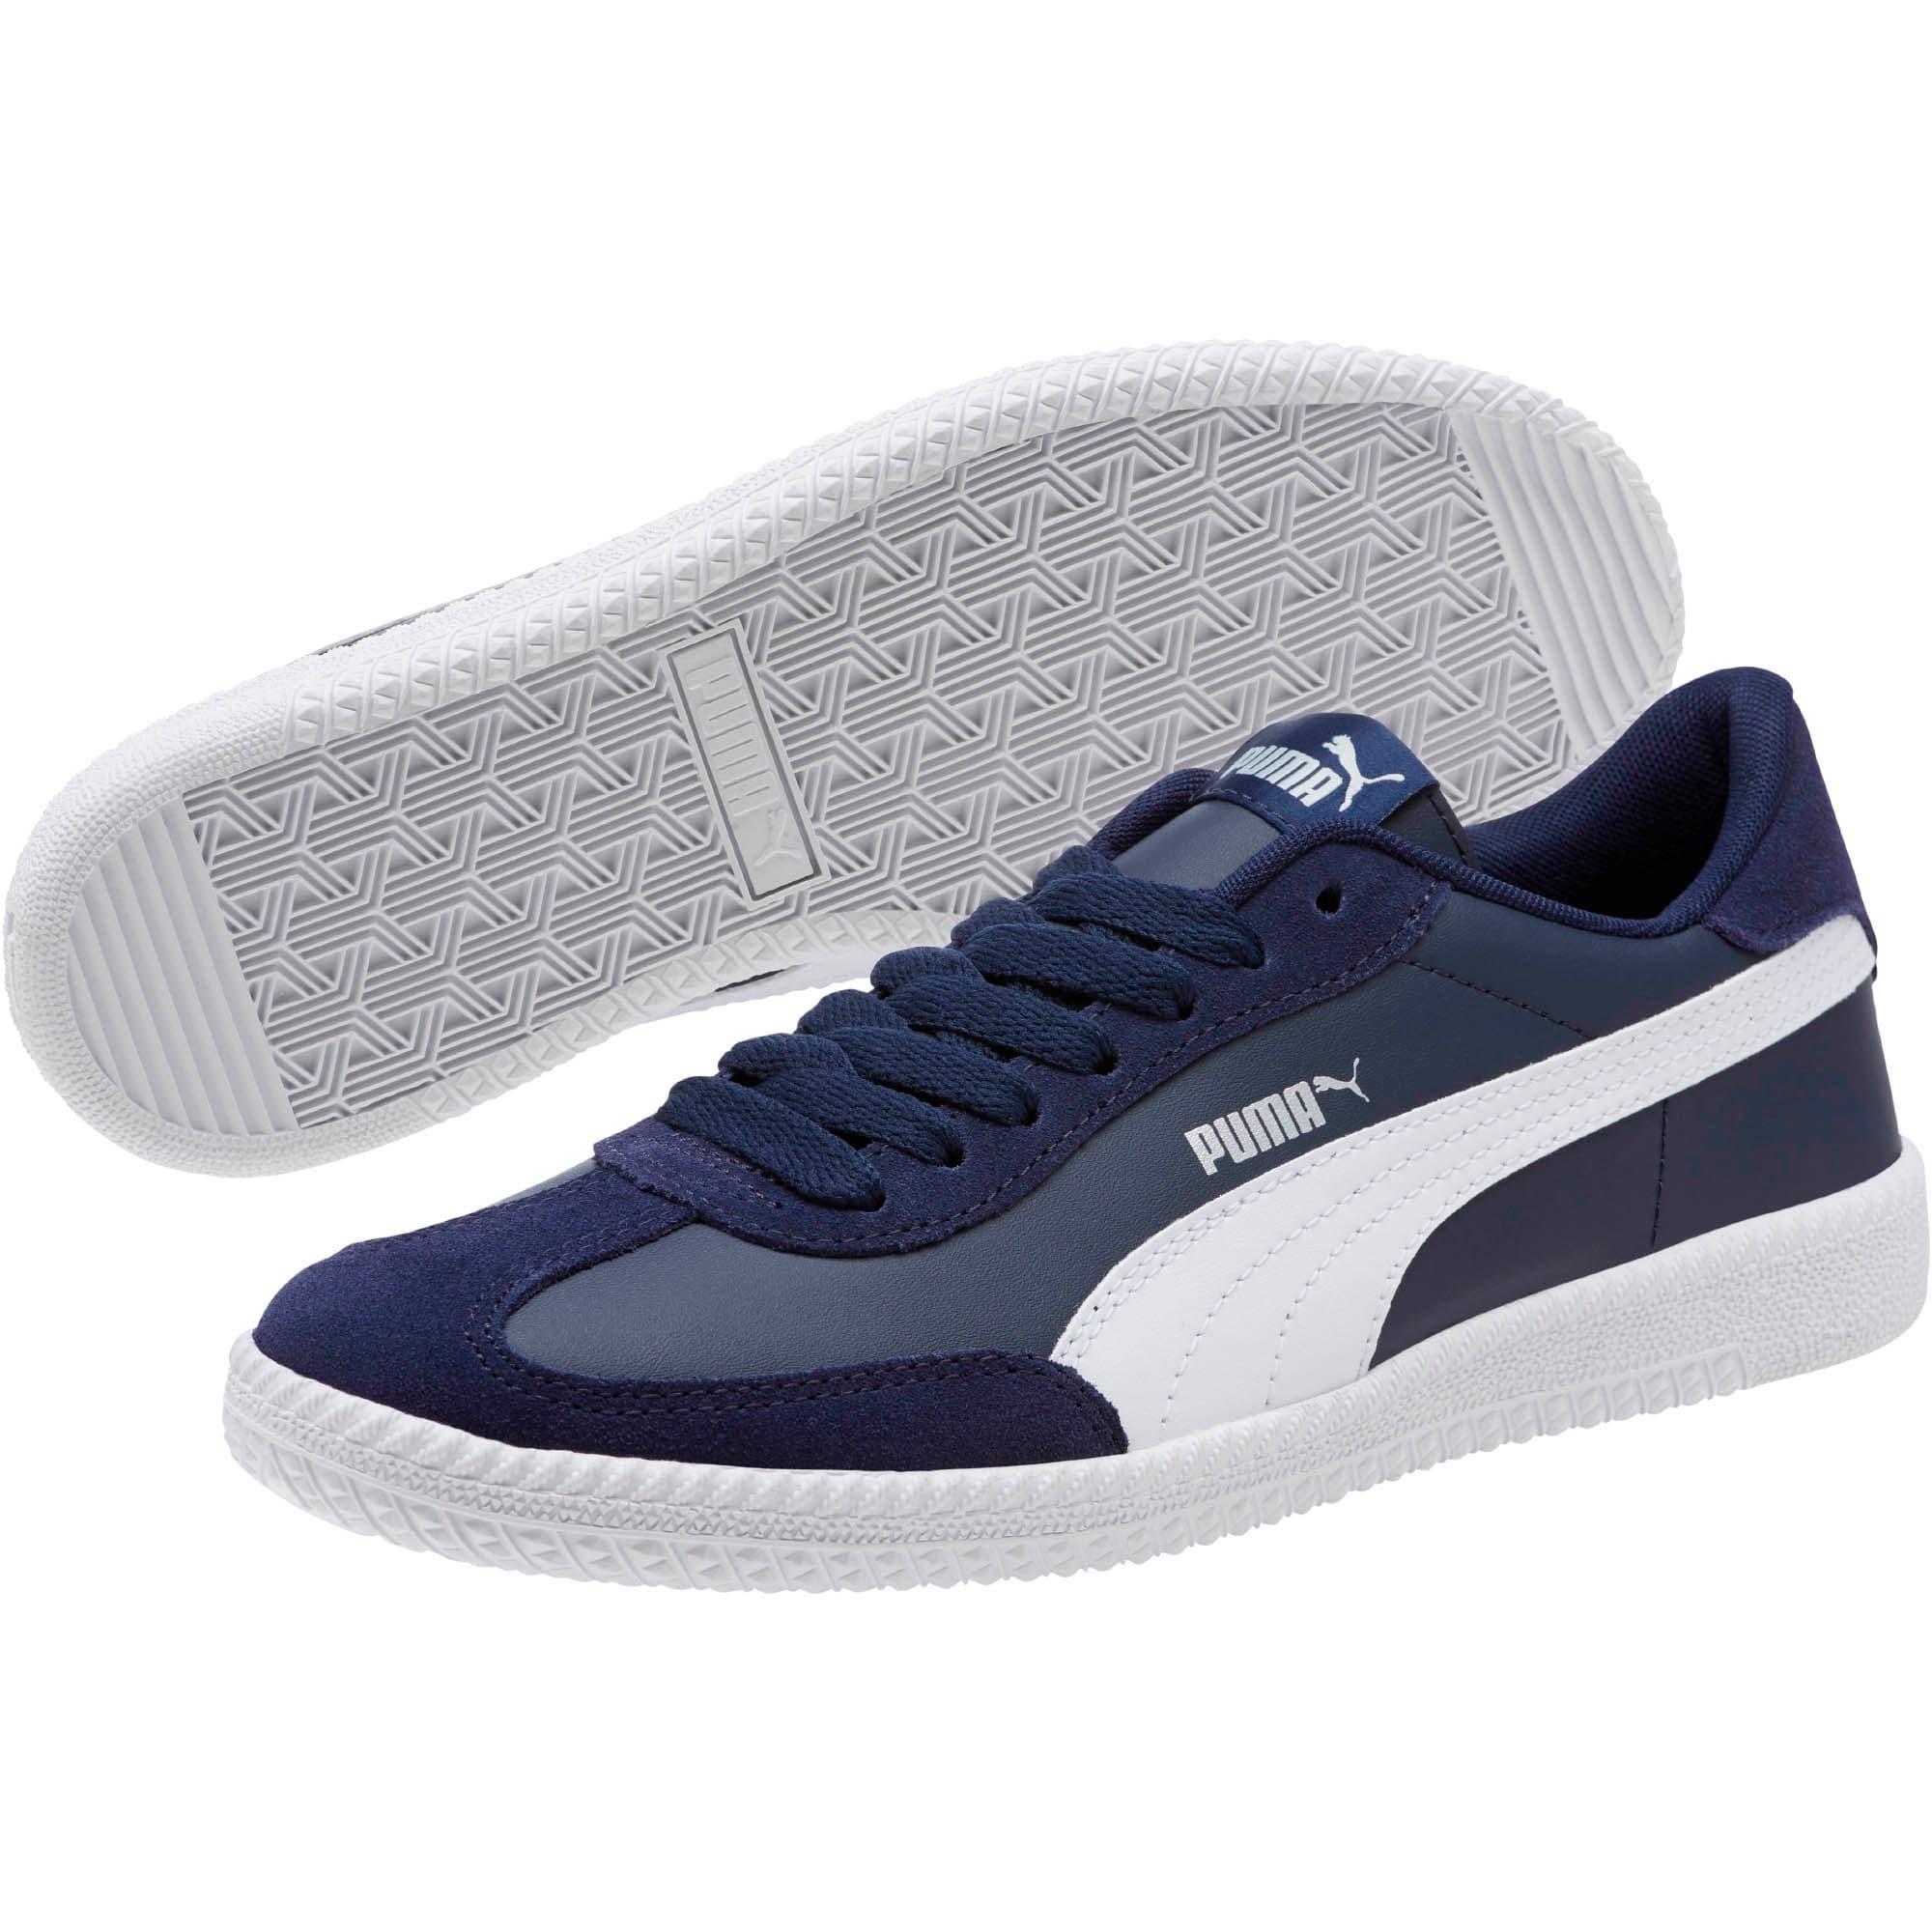 Thumbnail 2 of Astro Cup Sneakers, Peacoat-Puma White, medium